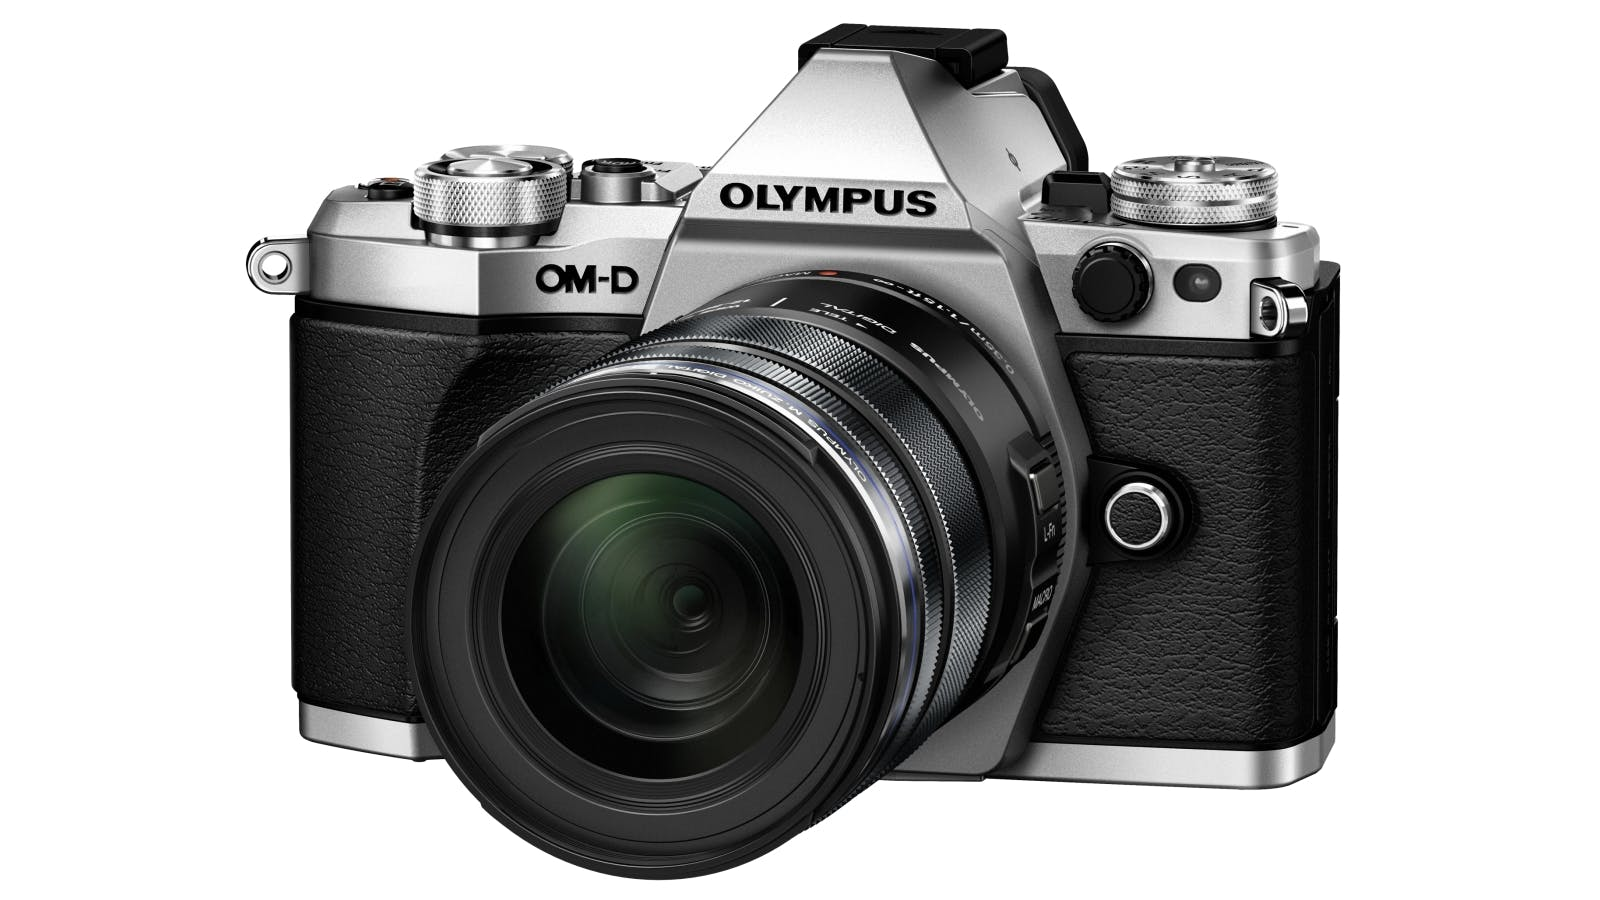 Camera Harvey Norman Dslr Cameras dslr interchangeable lens olympus nikon panasonic harvey om d e m5 mark ii with 12 50mm weatherproof kit